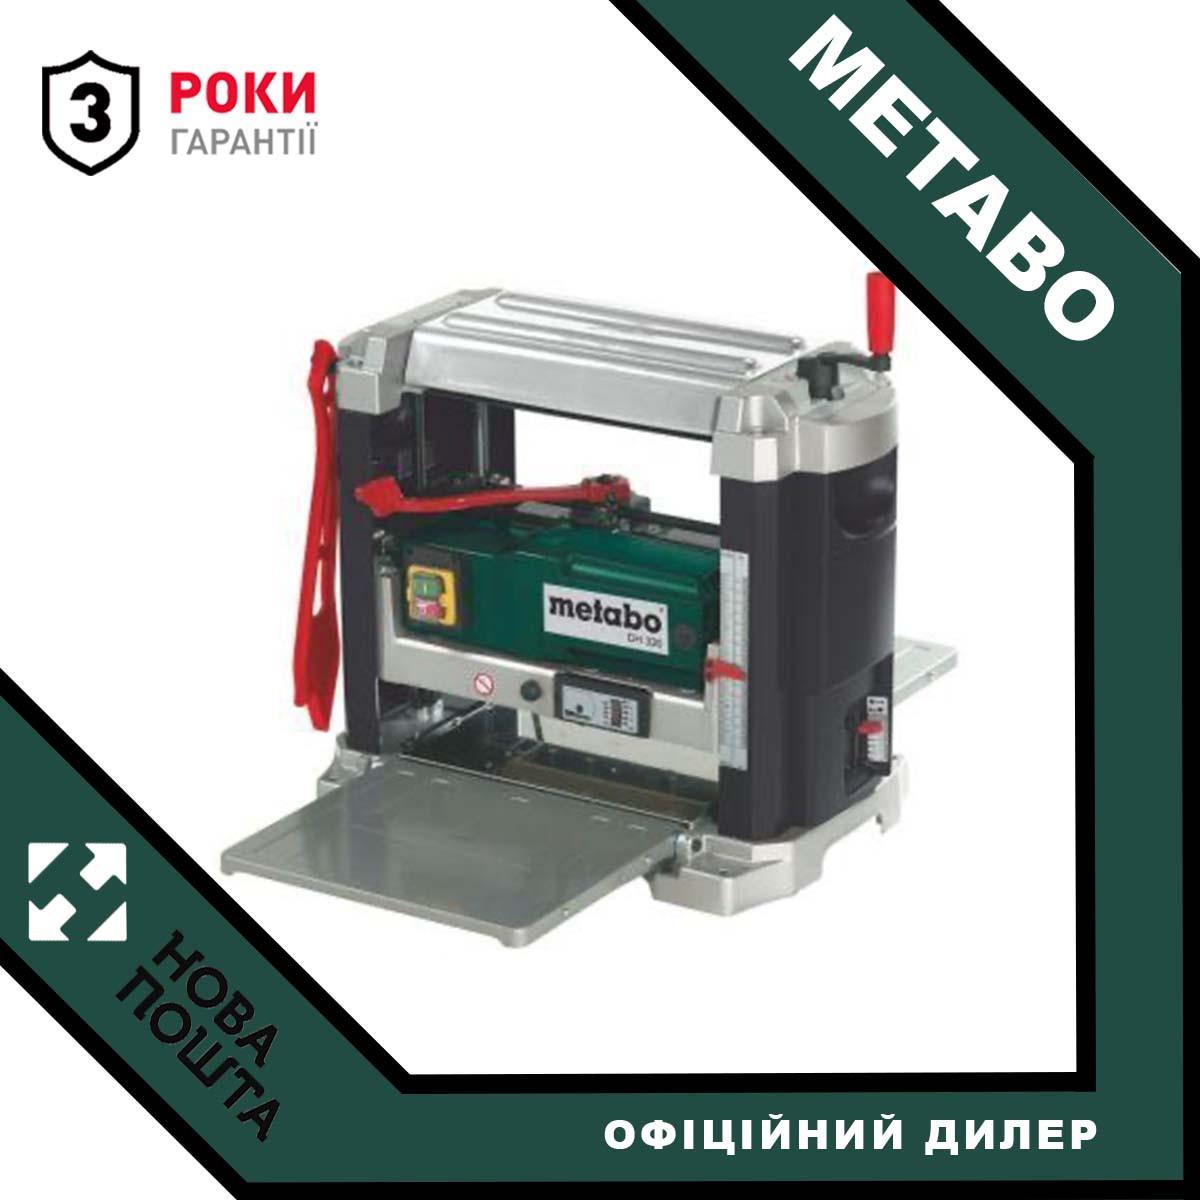 Рейсмусовий верстат Metabo DH 330